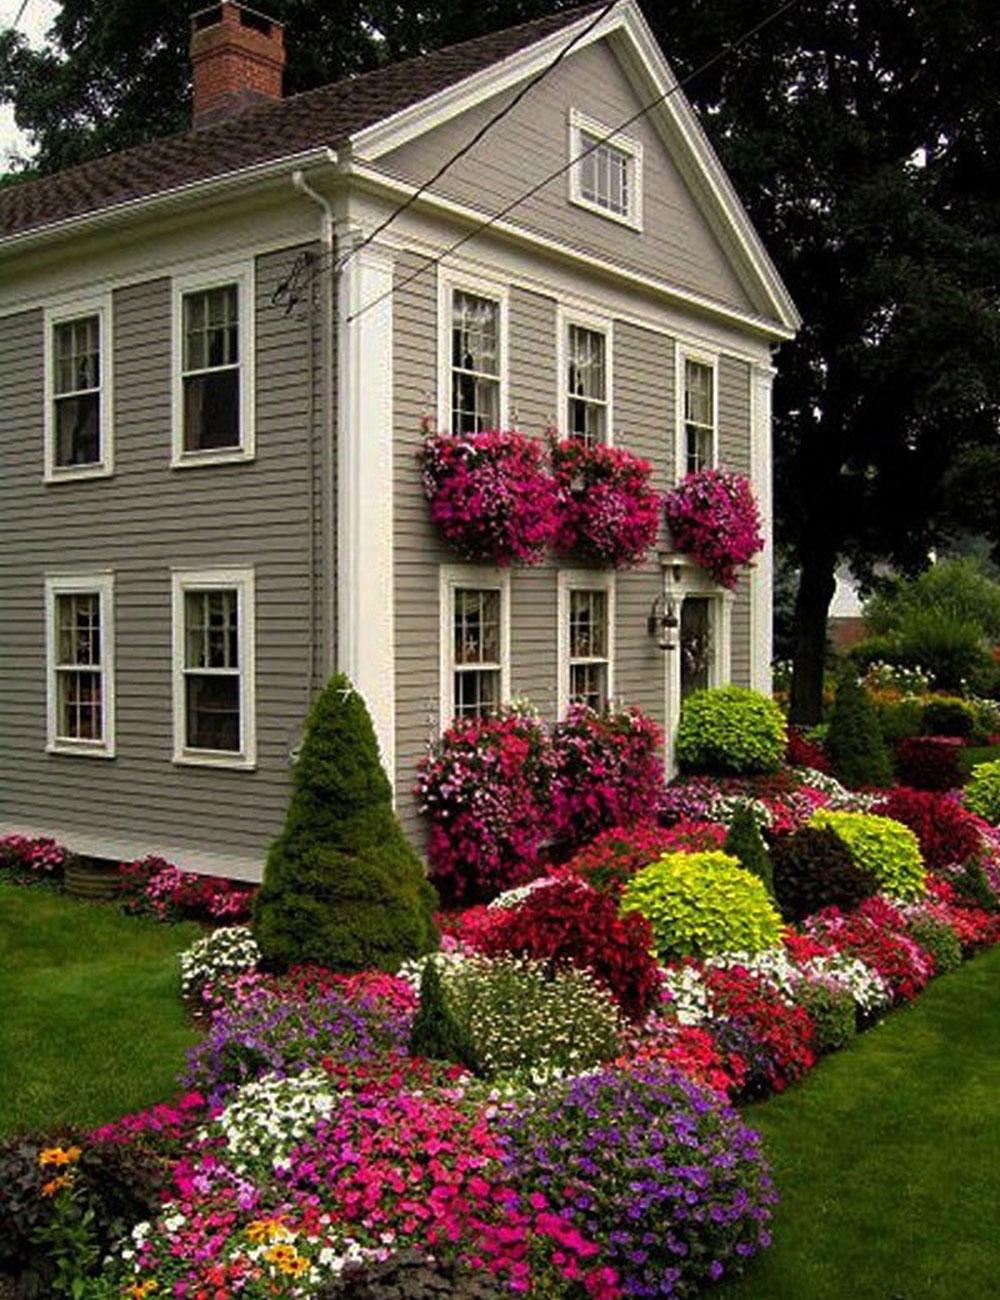 A-Showcase-Of-Beautiful-House-Yards-10 A Showcase of Beautiful House Yards